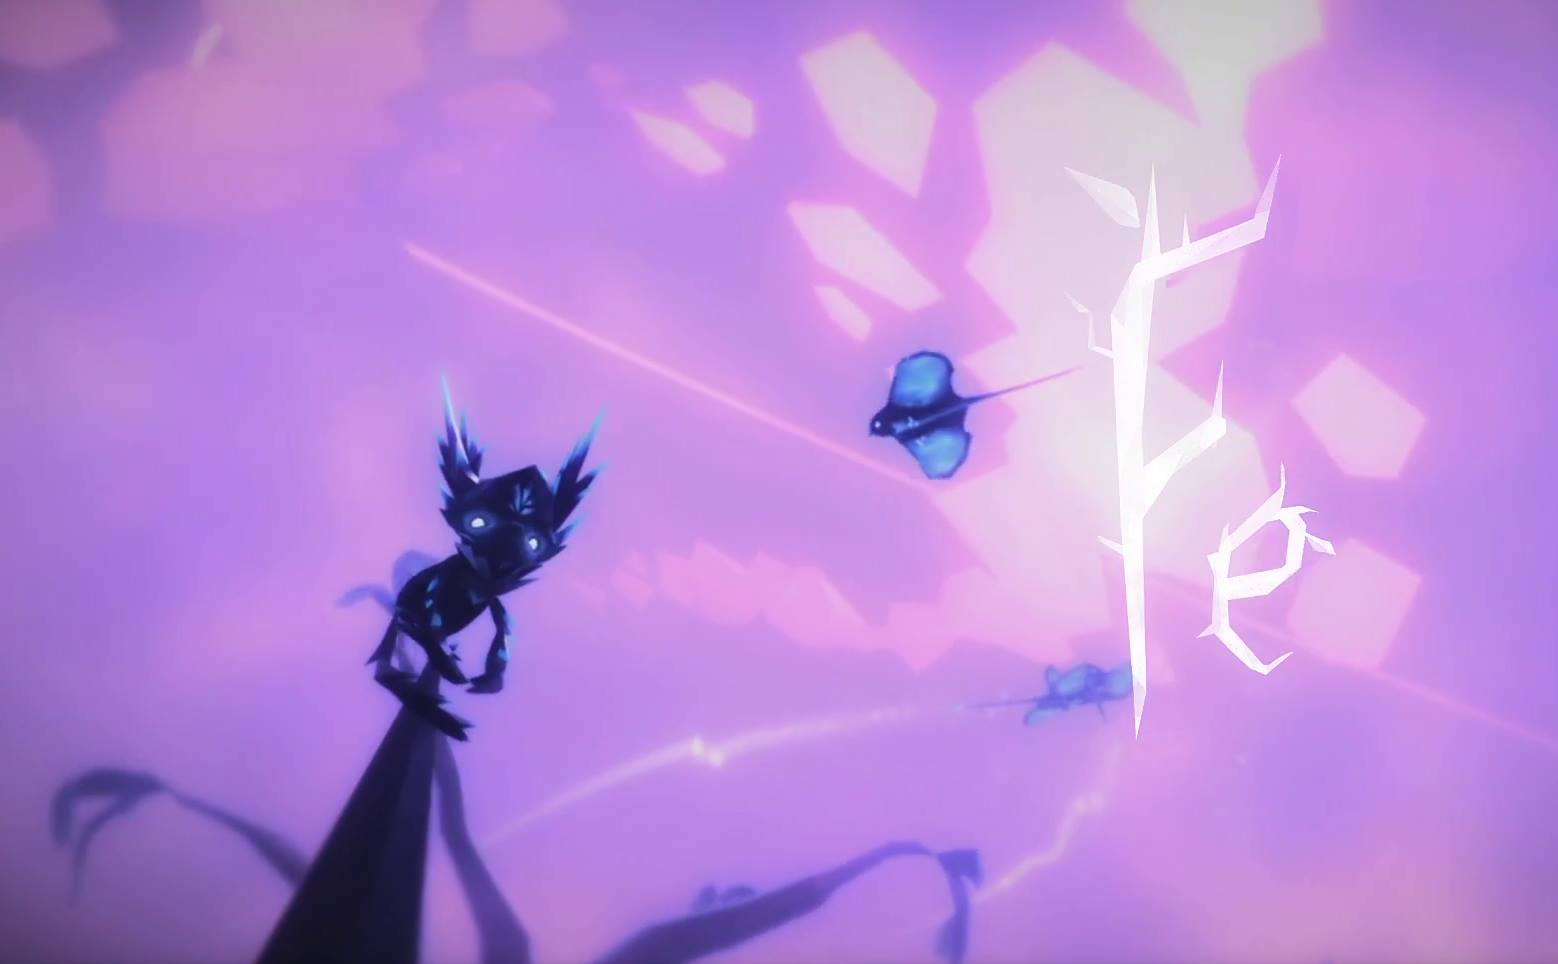 Fe Electronic Arts